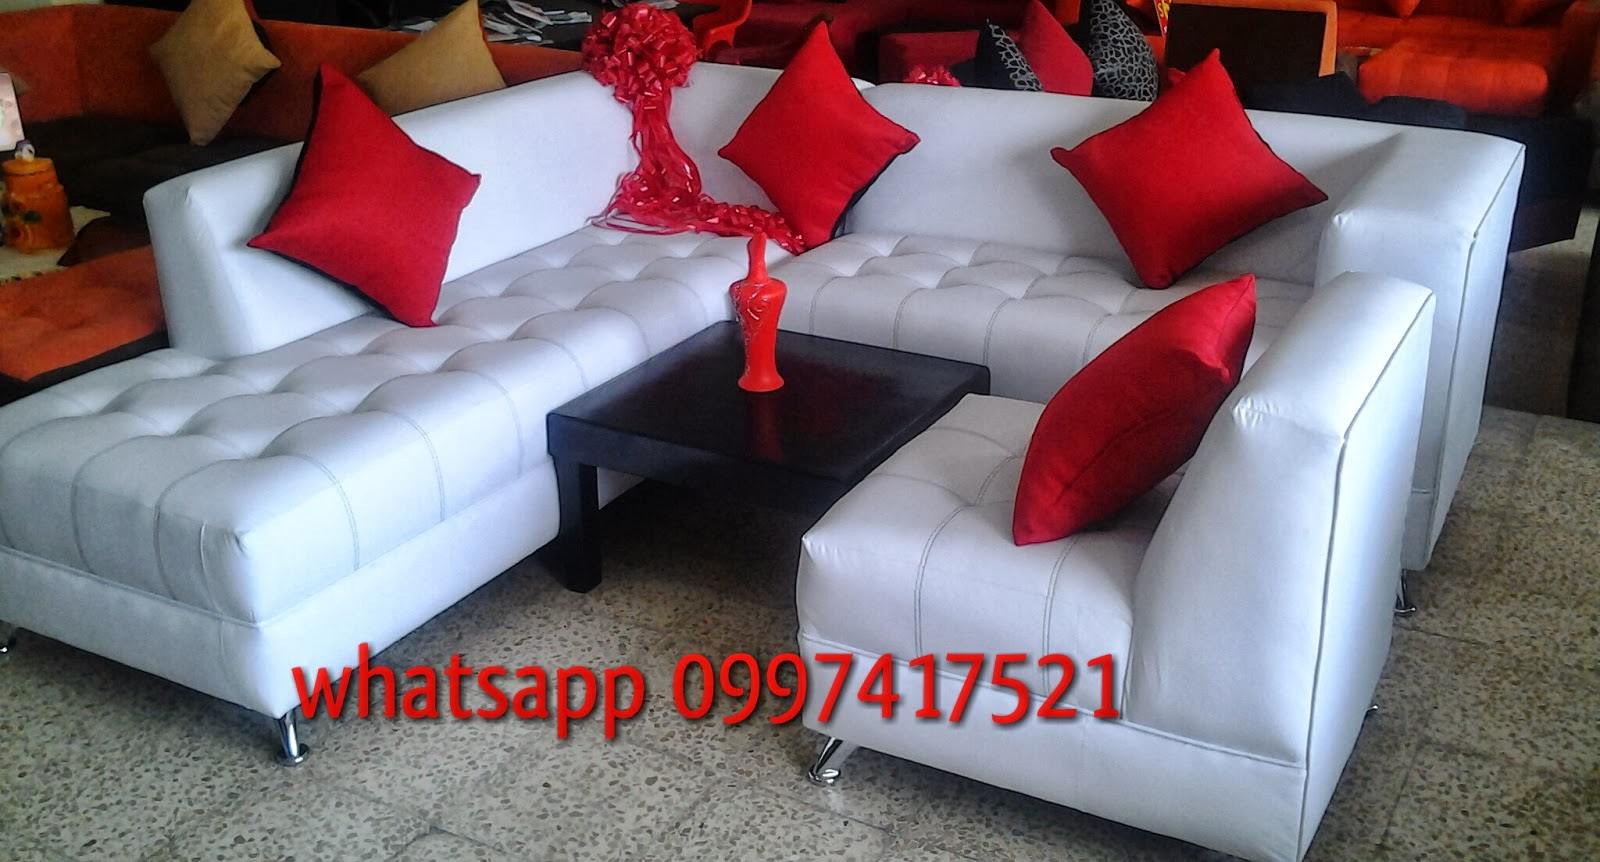 Muebles Dassconfort - Catalogo Dassconfort Whatsapp[mjhdah]http://3.bp.blogspot.com/-IqB9J07SkPg/UmXhOTU47AI/AAAAAAAAABM/wtvgBjc2n4Q/s1600/20130929_120348_wm.jpg